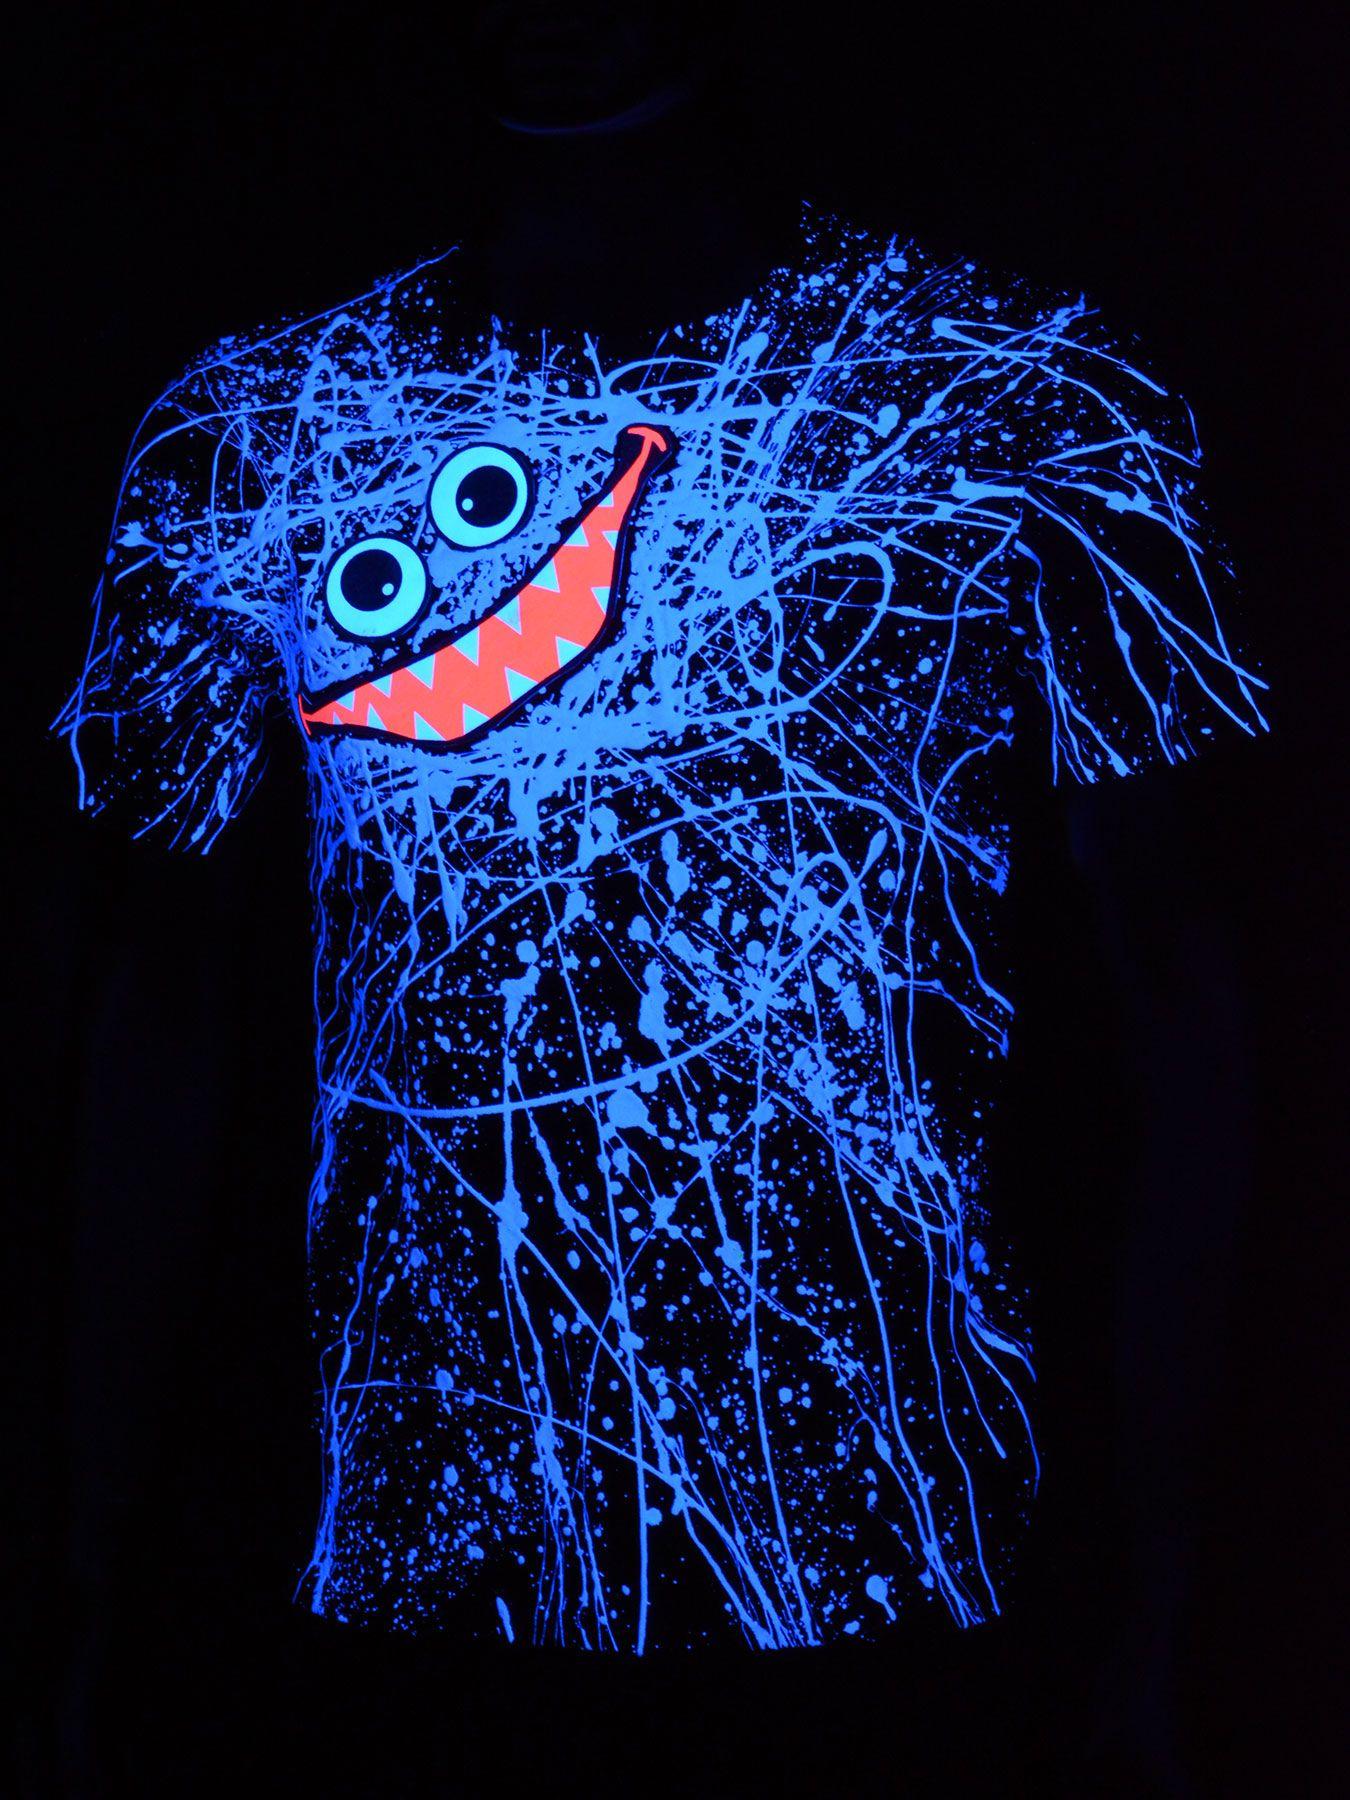 Black light t shirt ideas - Schwarzlicht T Shirt Neon Blue Scribble Face Unisex Black Blacklight Schwarzlicht